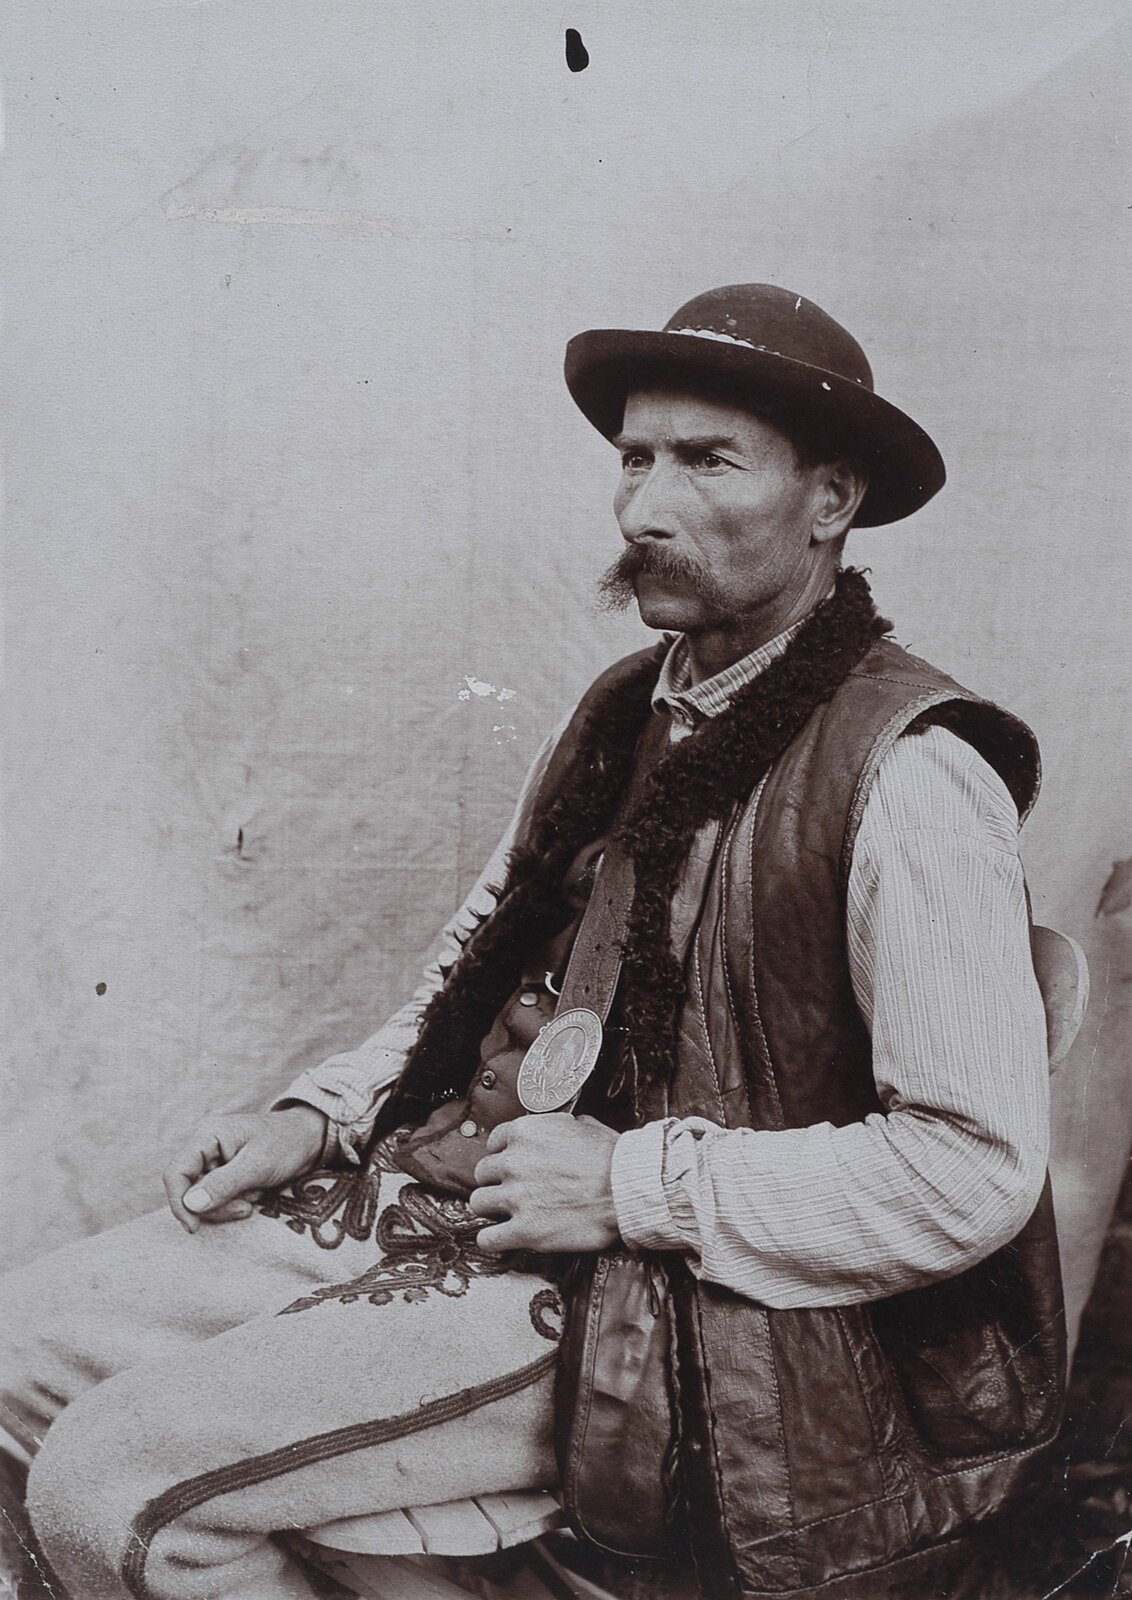 Klimek Bachleda wstroju góralskim, ok. 1900 Klimek Bachleda wstroju góralskim, ok. 1900 Źródło: domena publiczna.